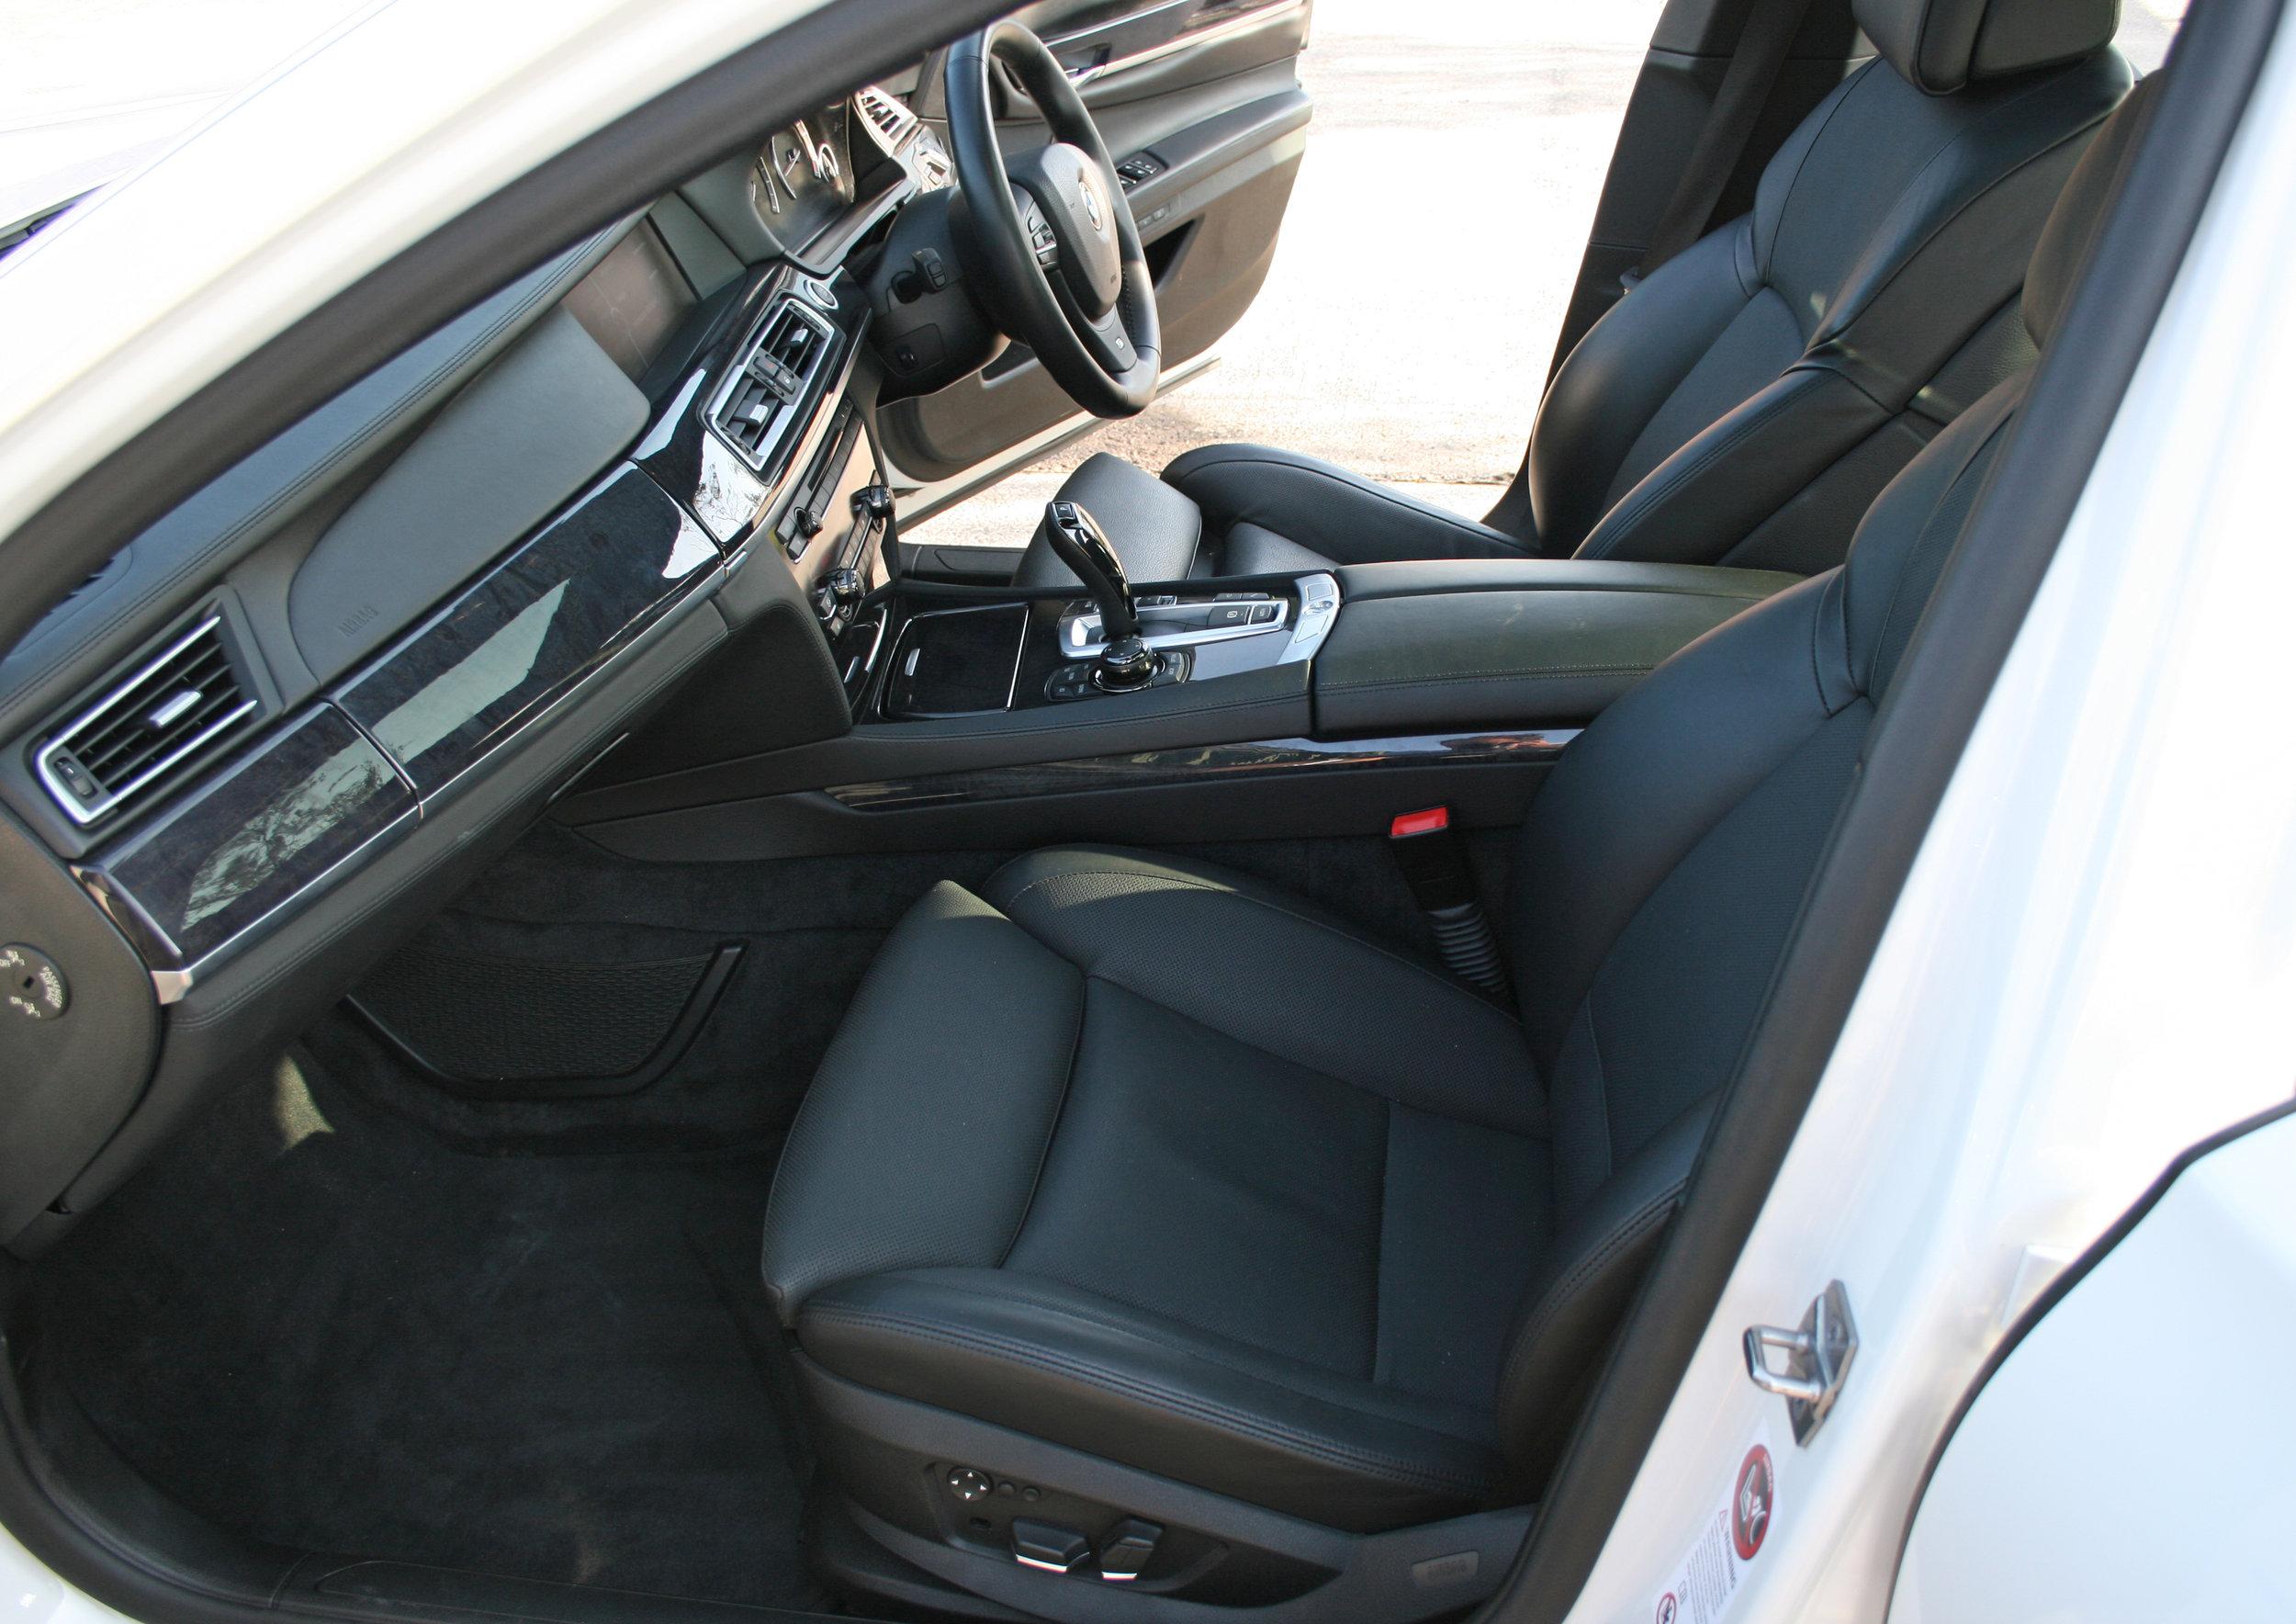 INTERIOR FROINT SEATS.jpg